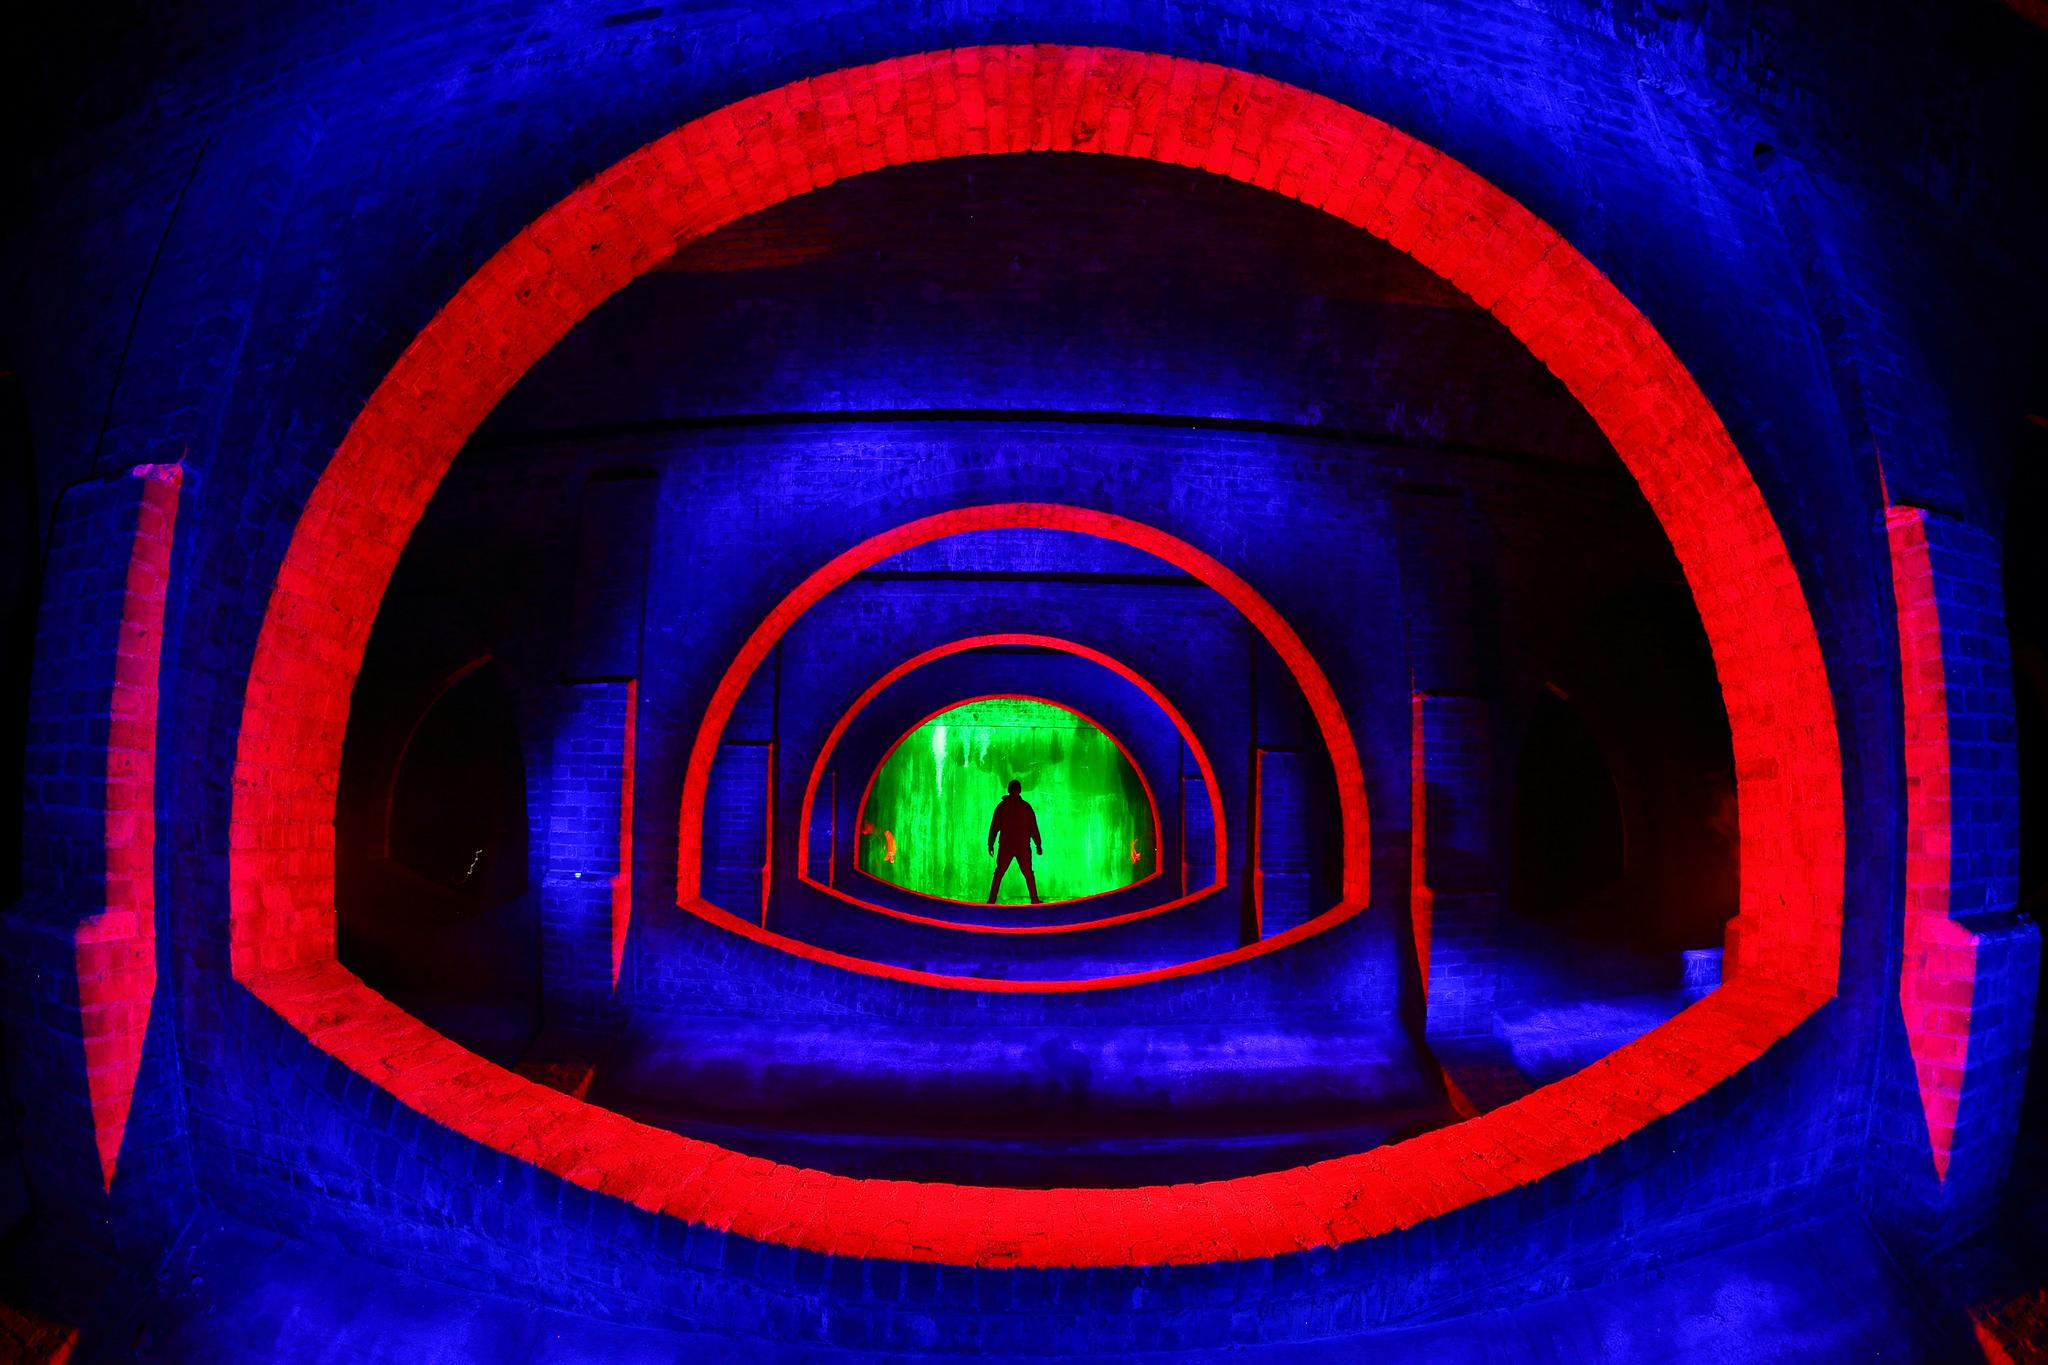 DanWhitaker_SubterraneanOcularOverload.jpg